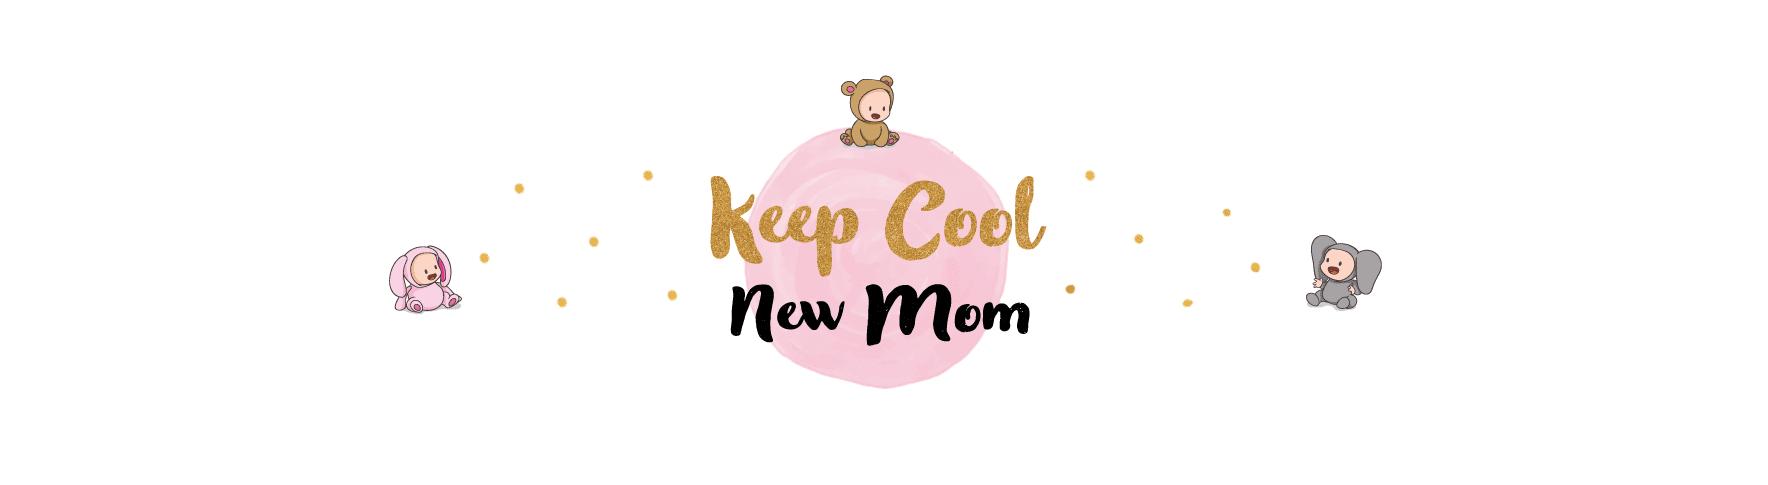 Bannière Keep Cool New Mom